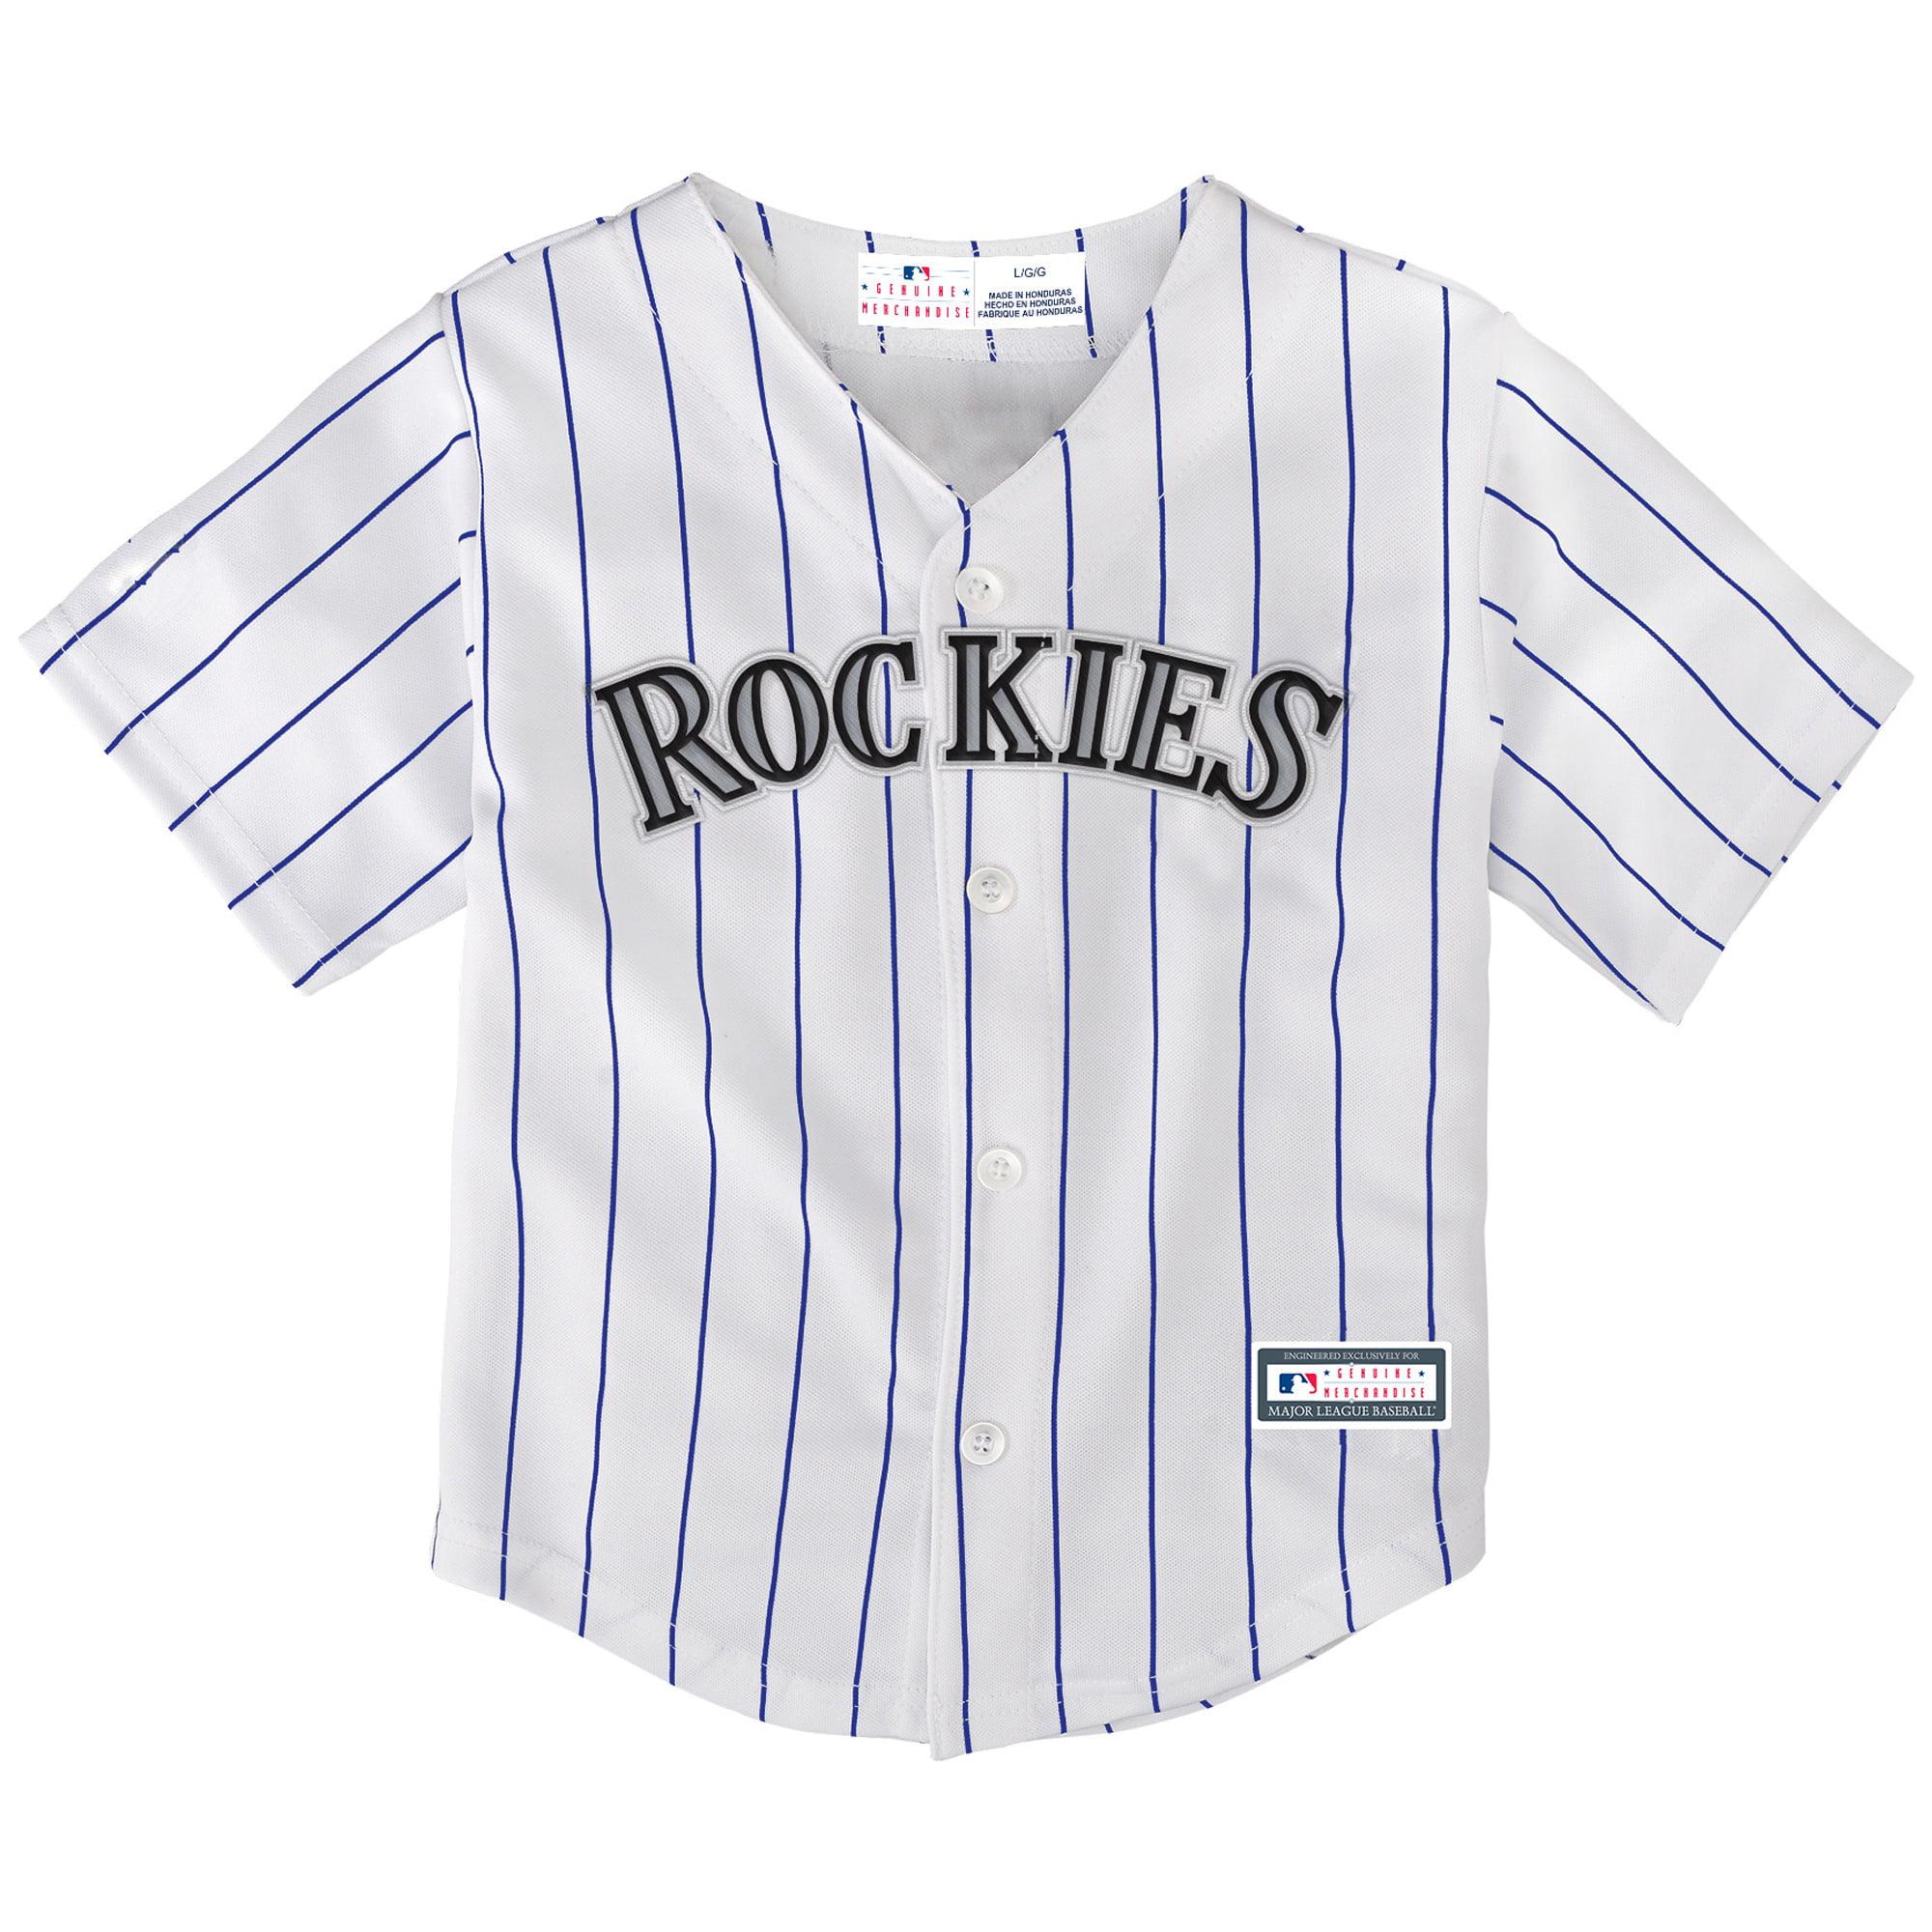 Colorado Rockies Toddler Home Replica Team Jersey - White/Purple